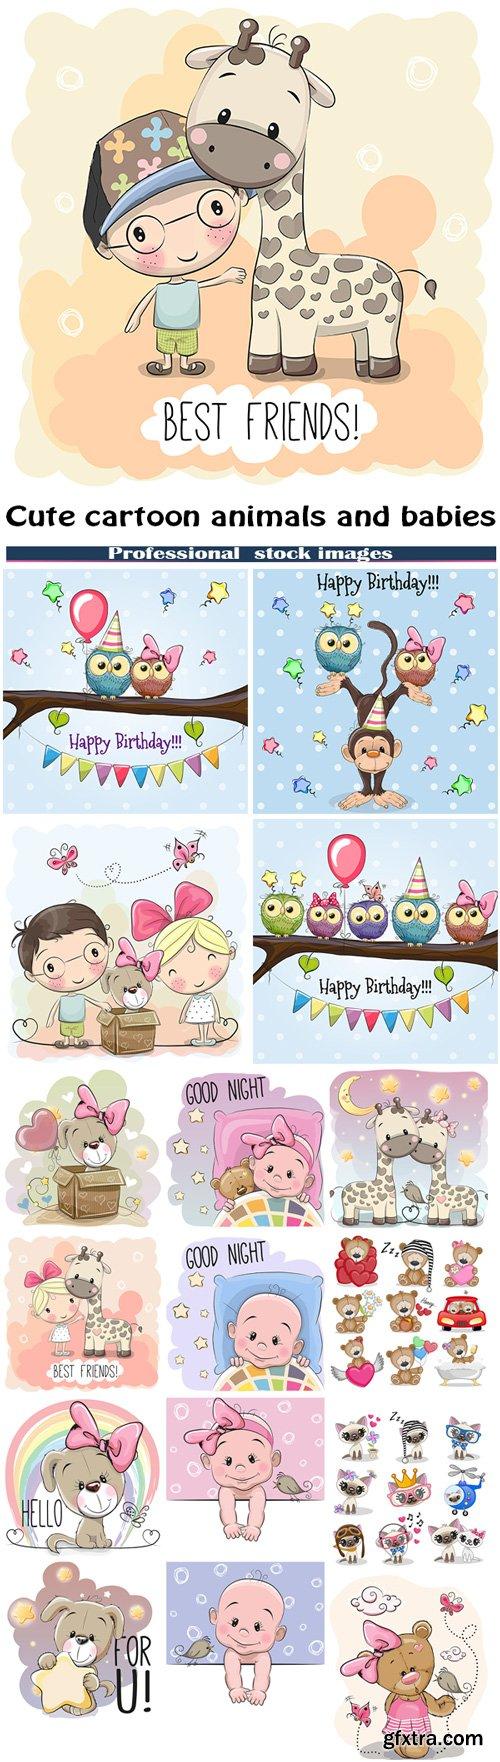 Cute cartoon animals and babies